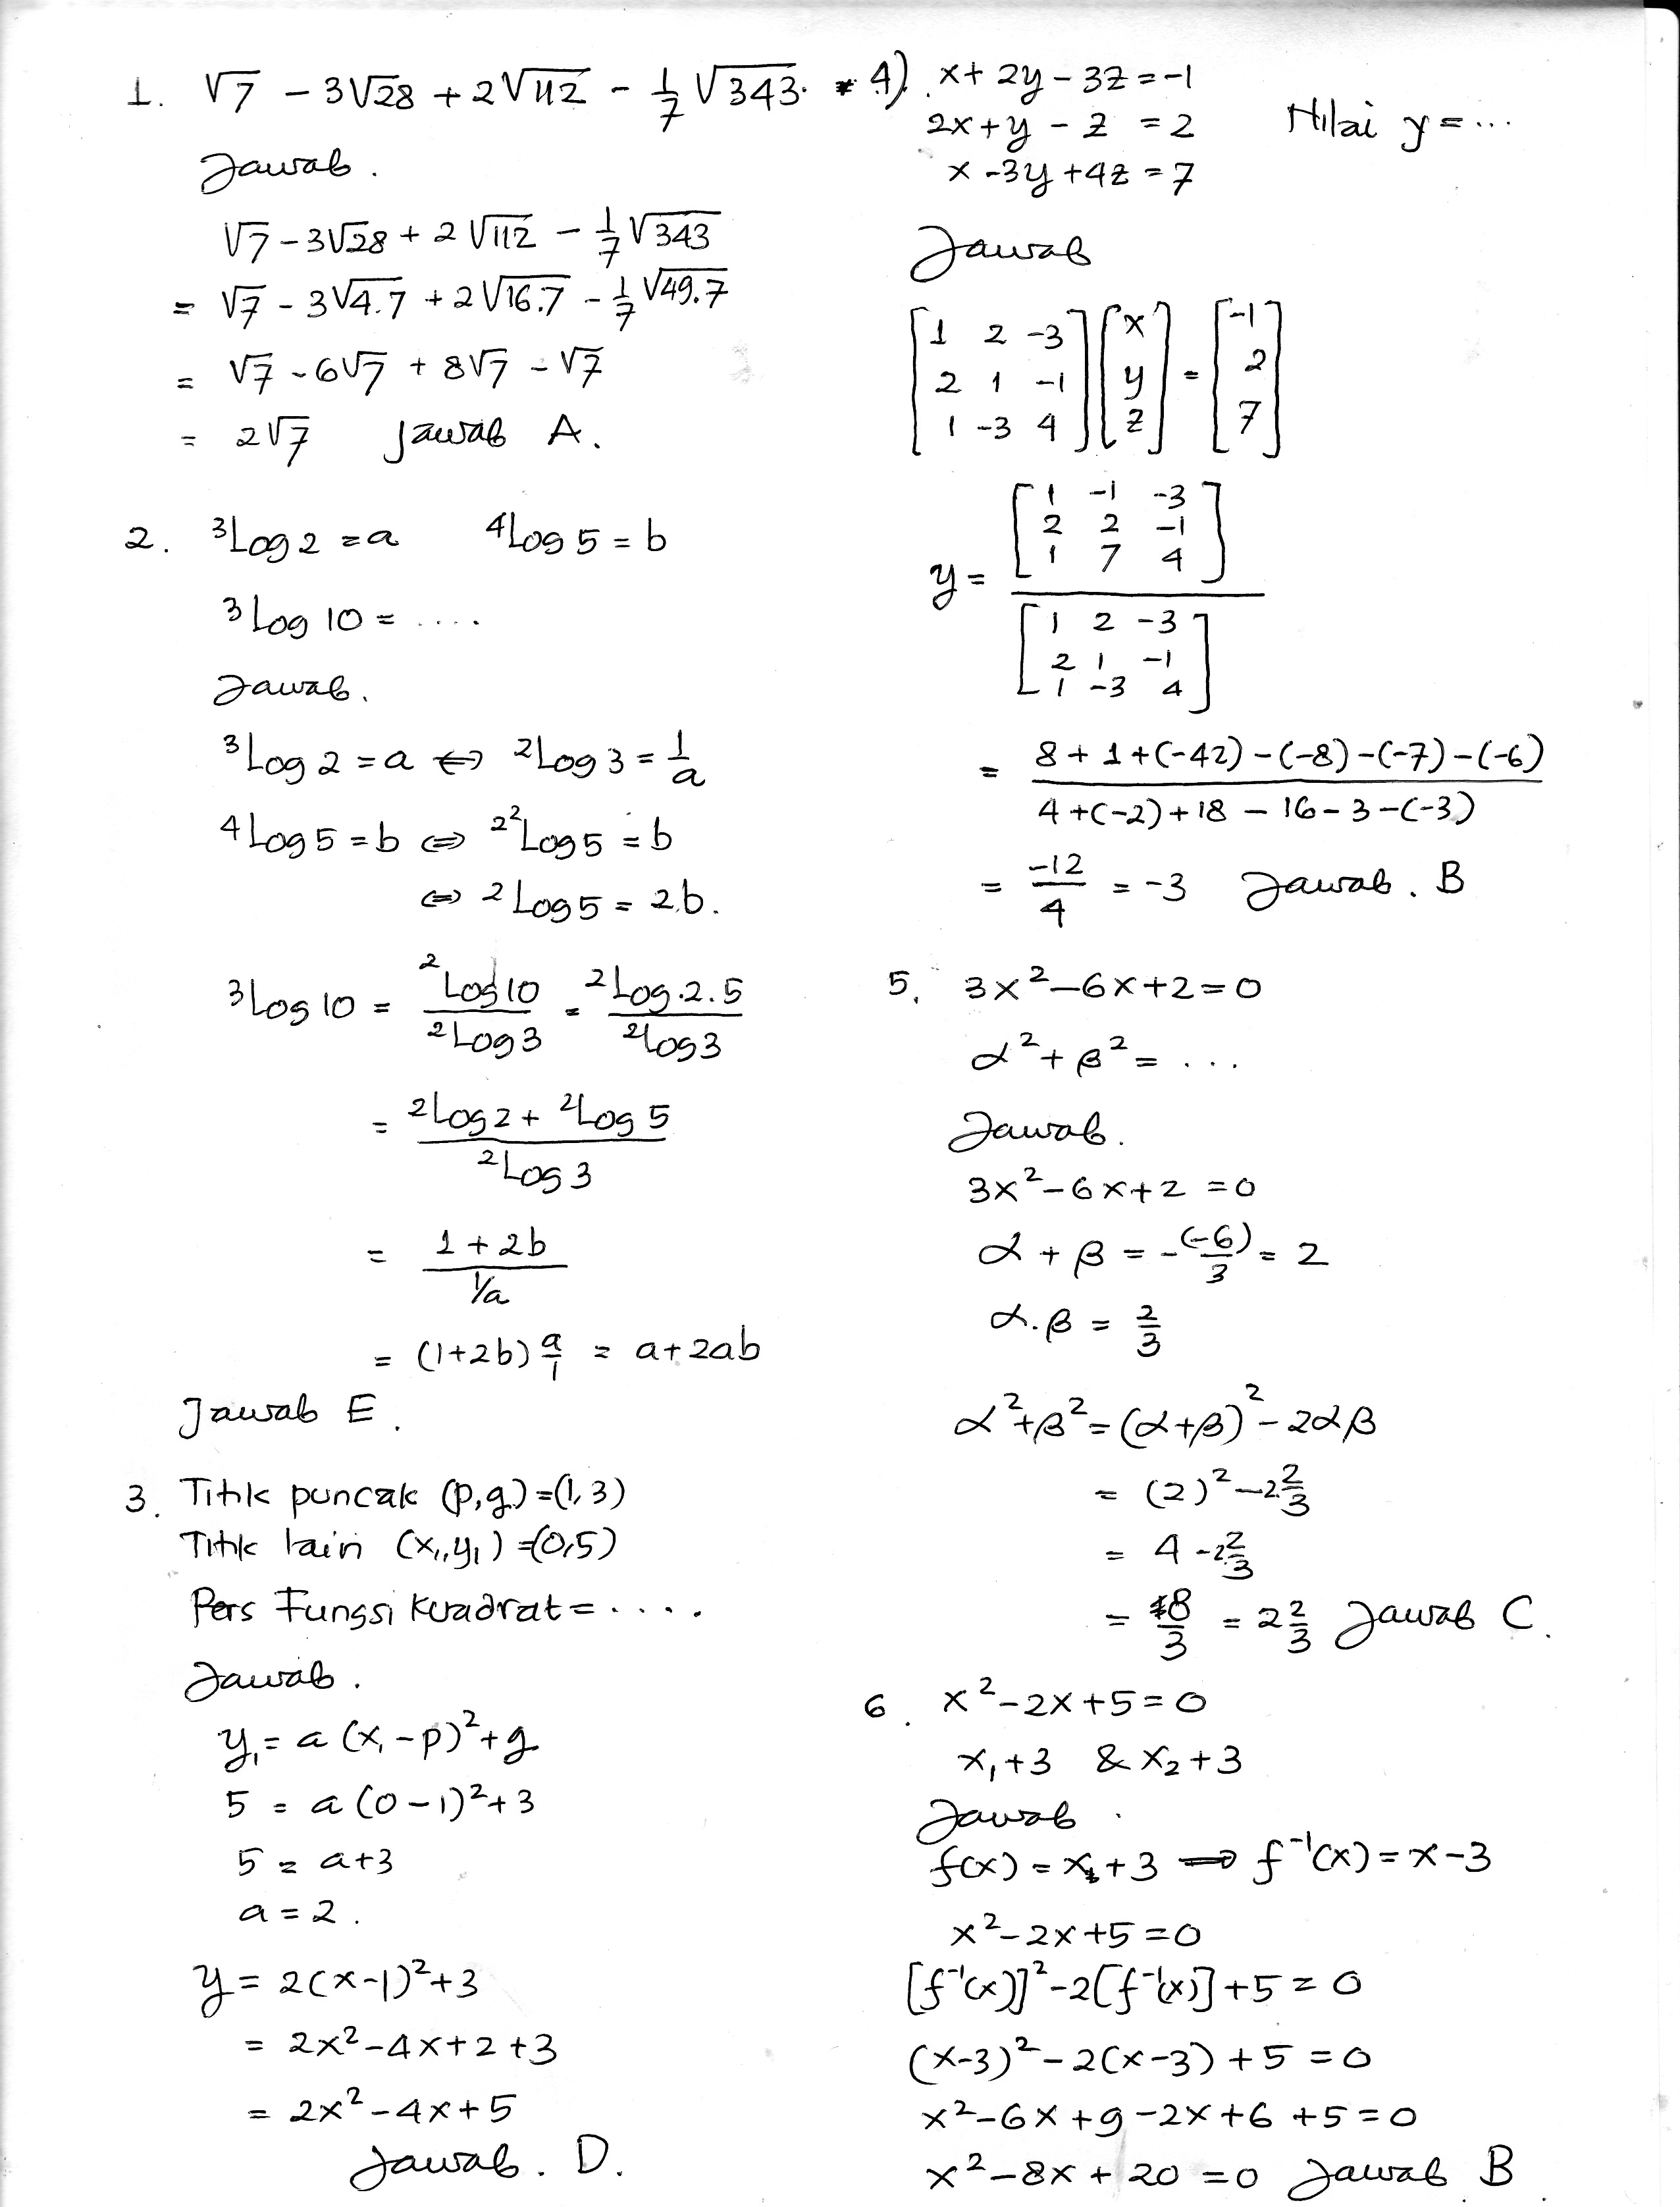 65 Soal Matematika Kelas Vi Sd Soalmatematikacom January 29 2016 Soal Matematika Com Bank